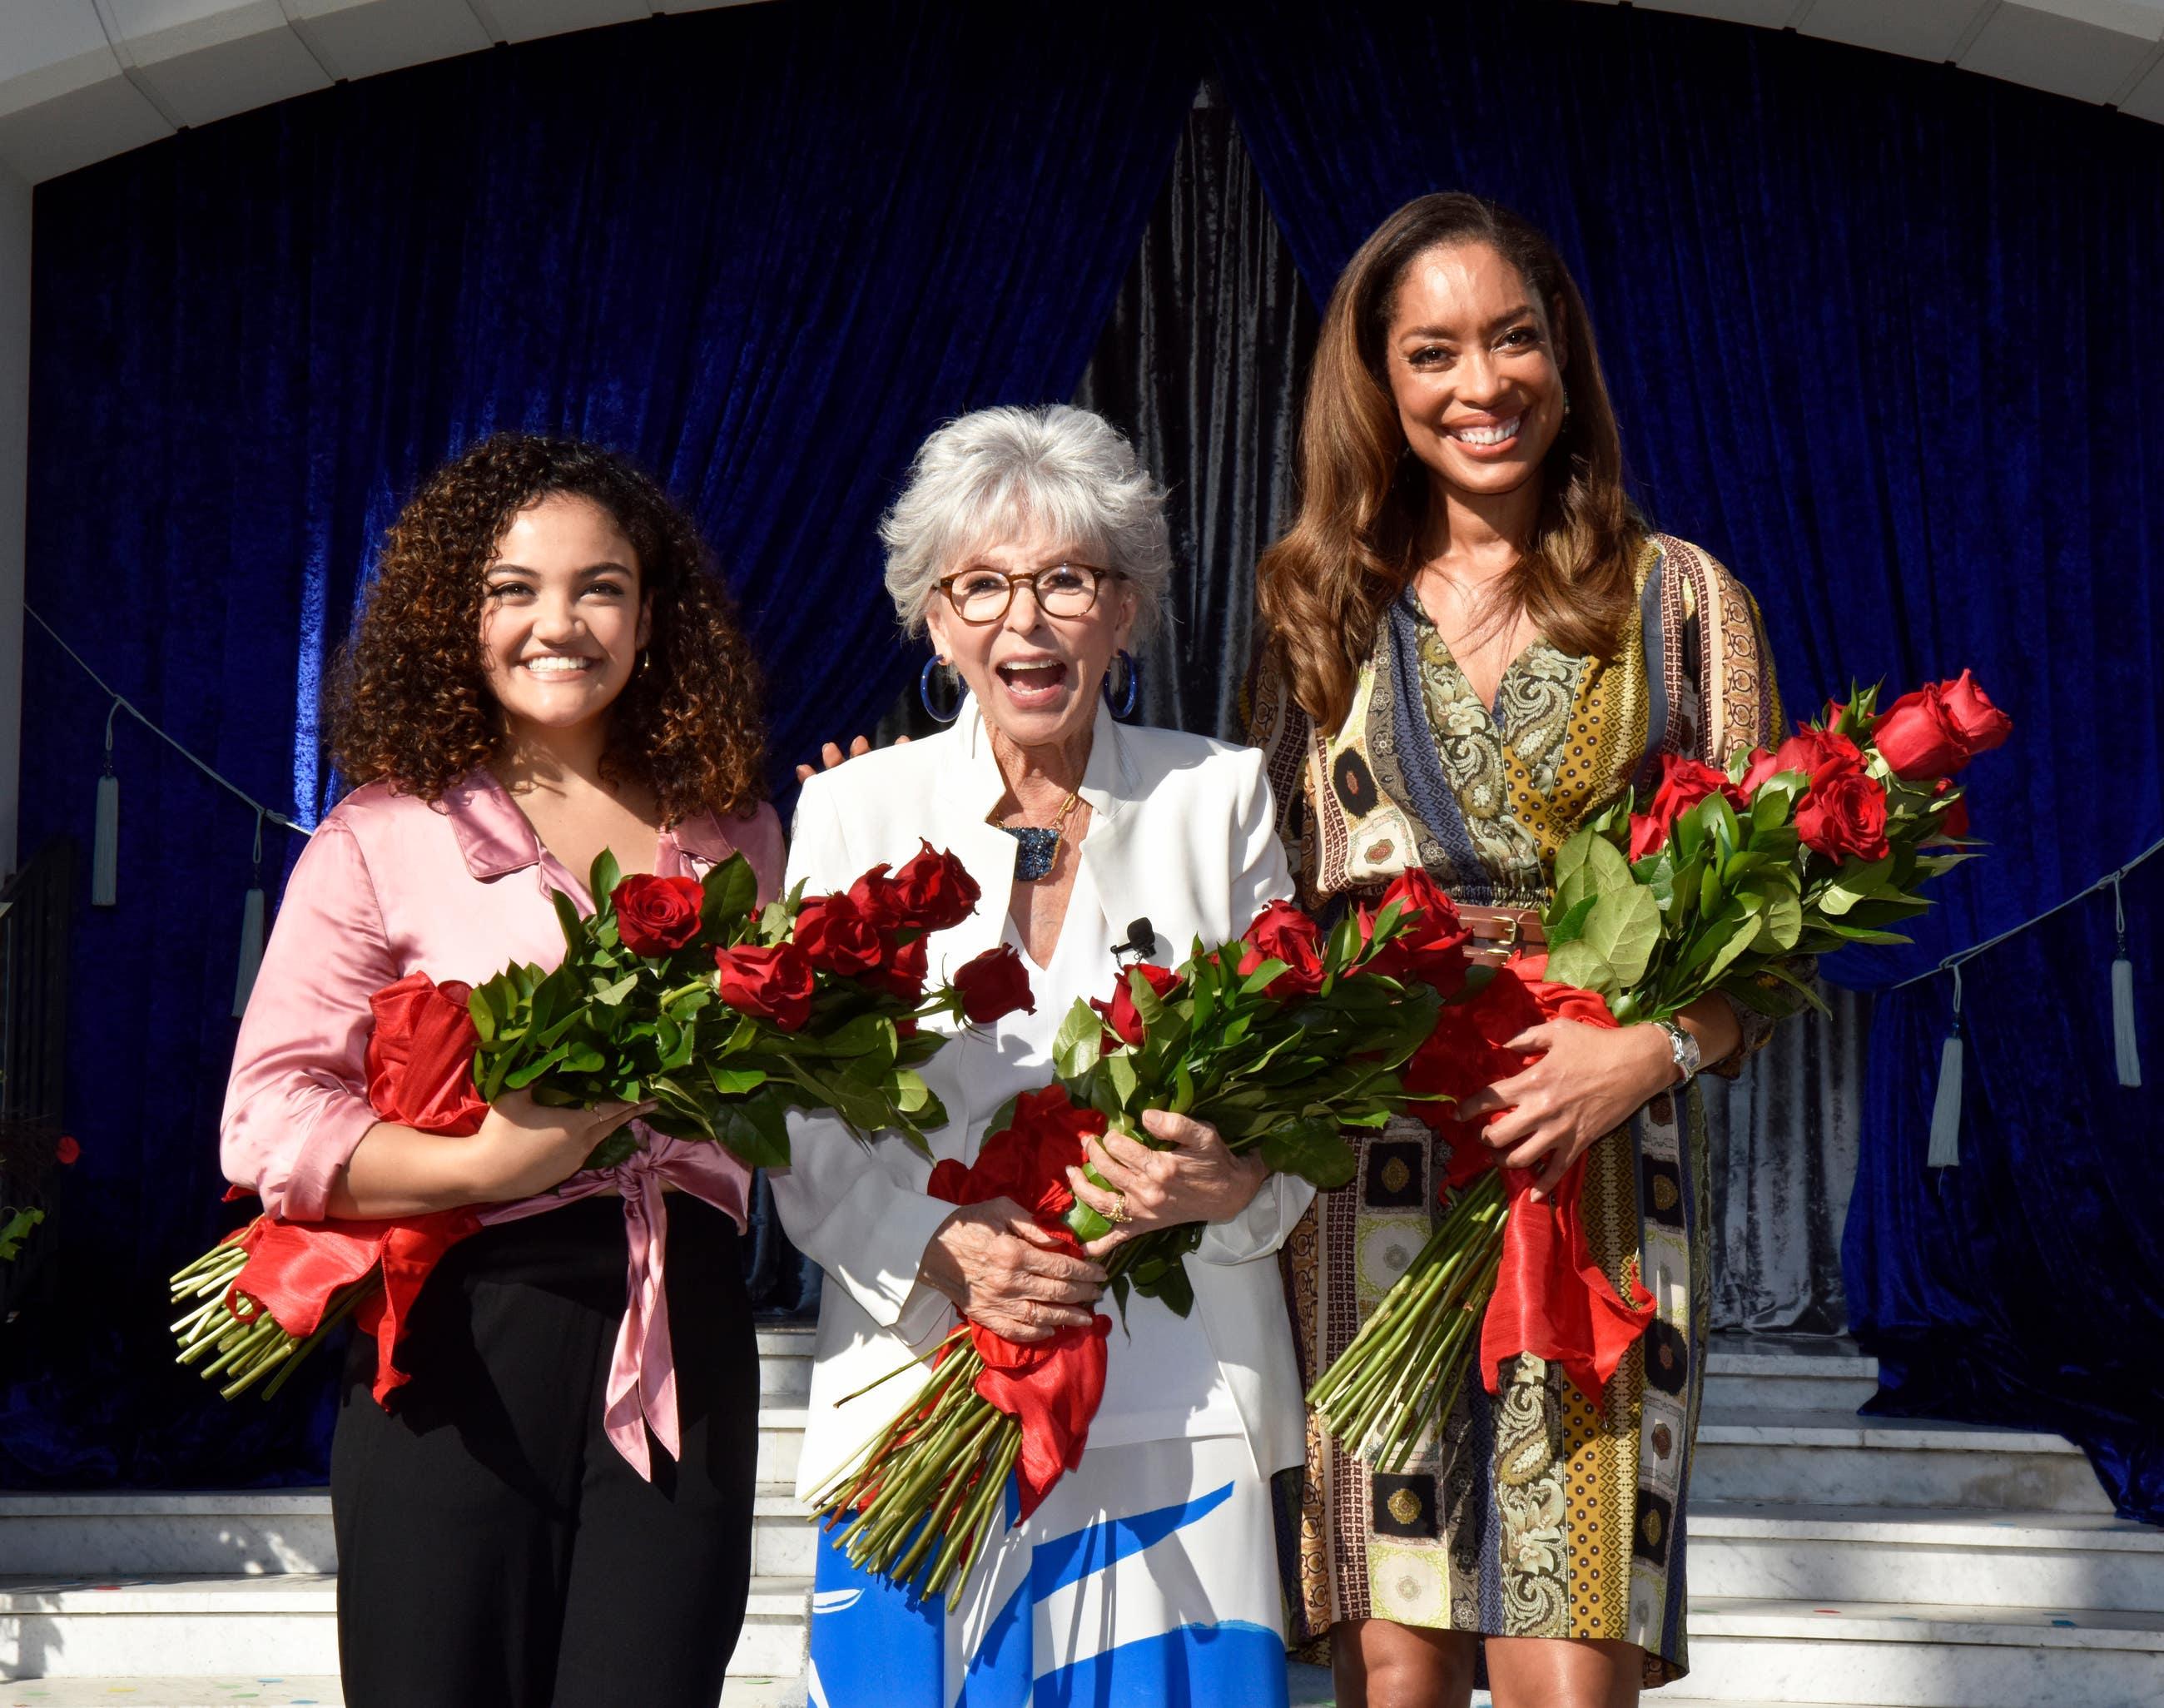 Tournament of Roses 2020 Grand Marshals Laurie Hernandez, Rita Moreno and Gina Torres